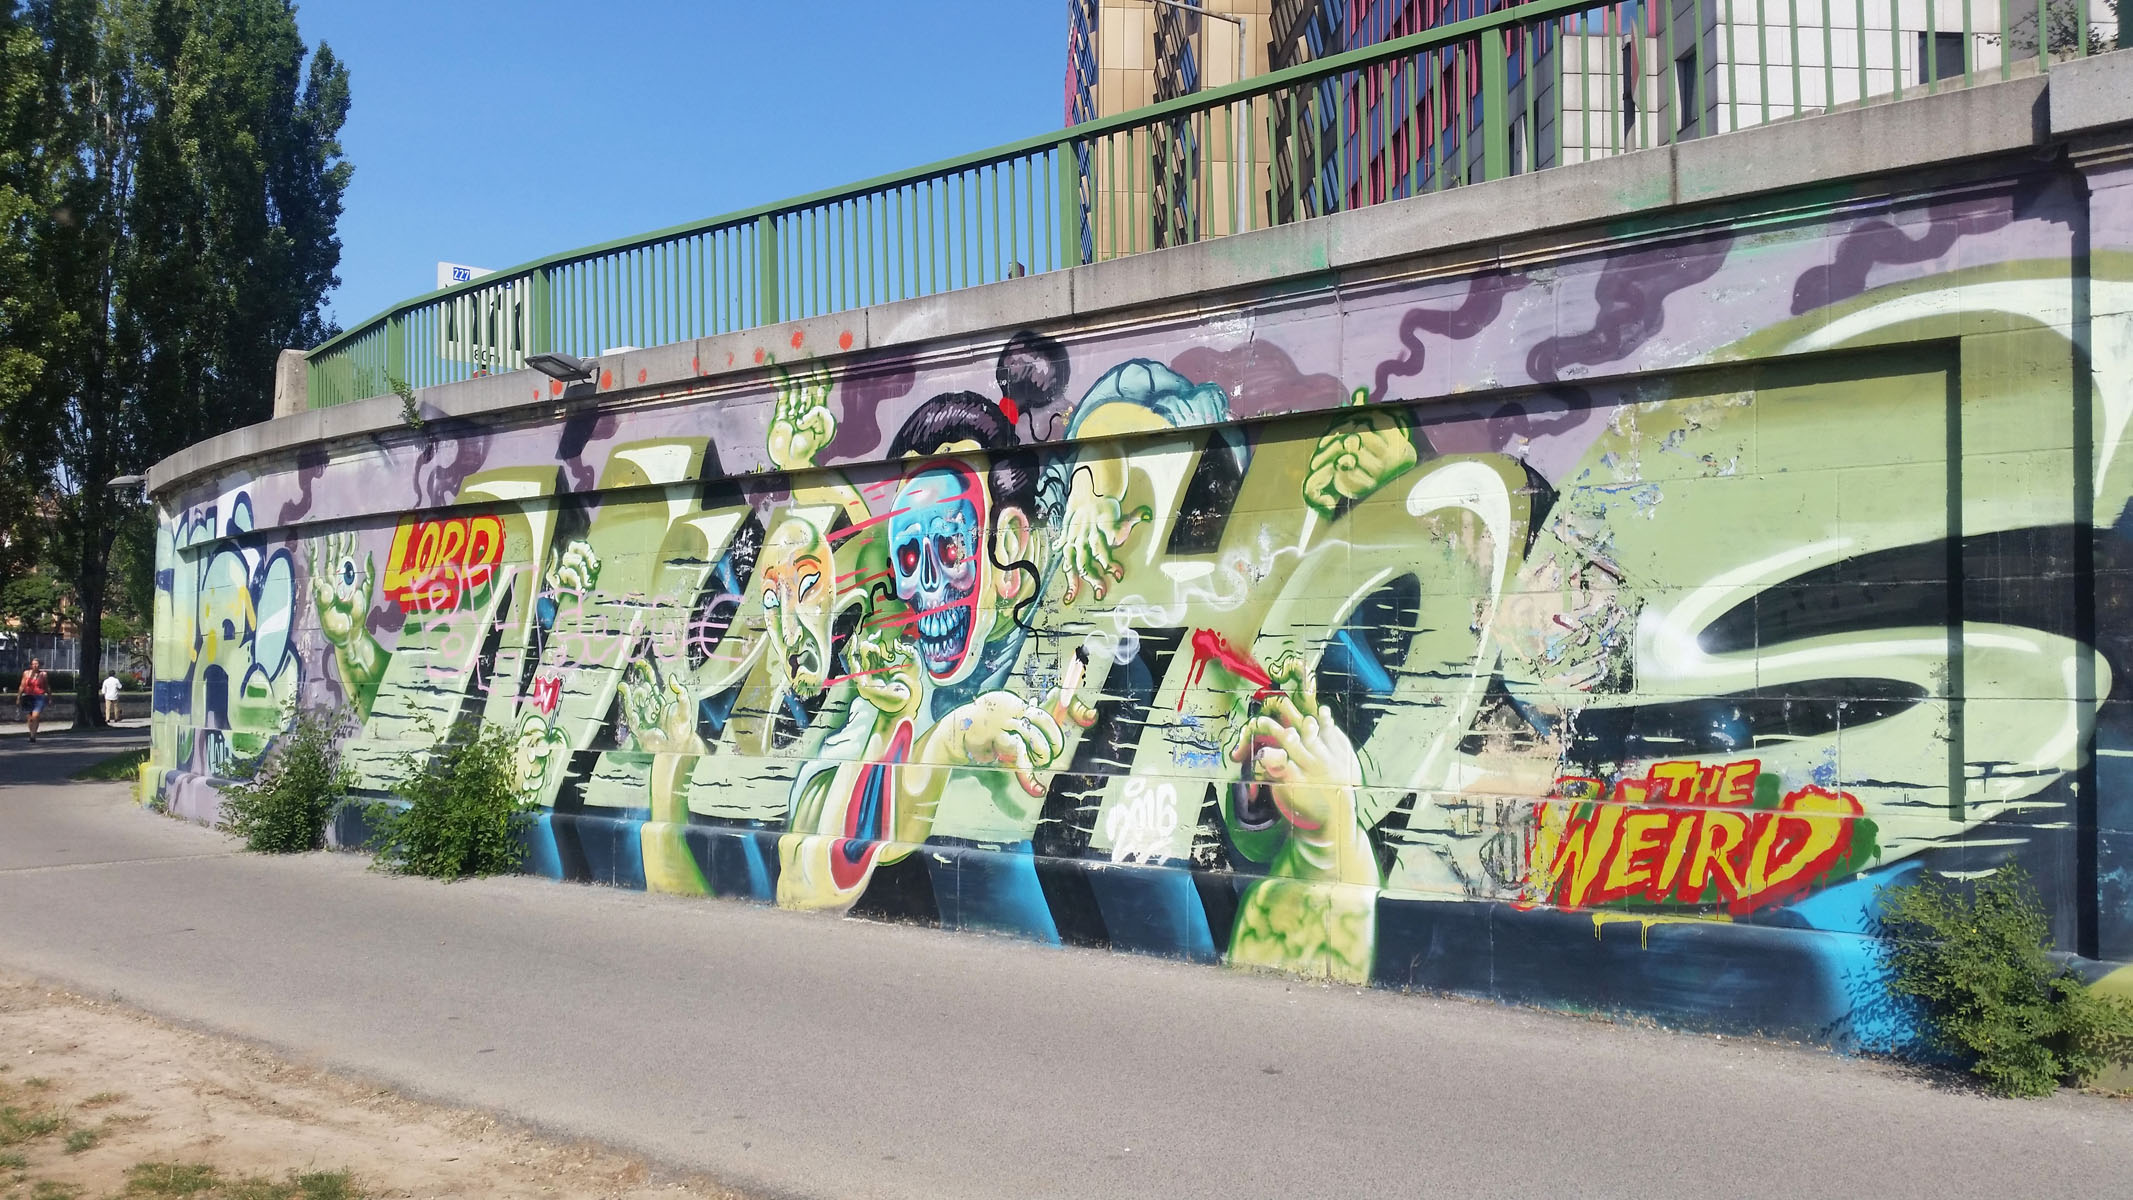 Arte urbana a Vienna, lungo il Dounakanal: Nychos